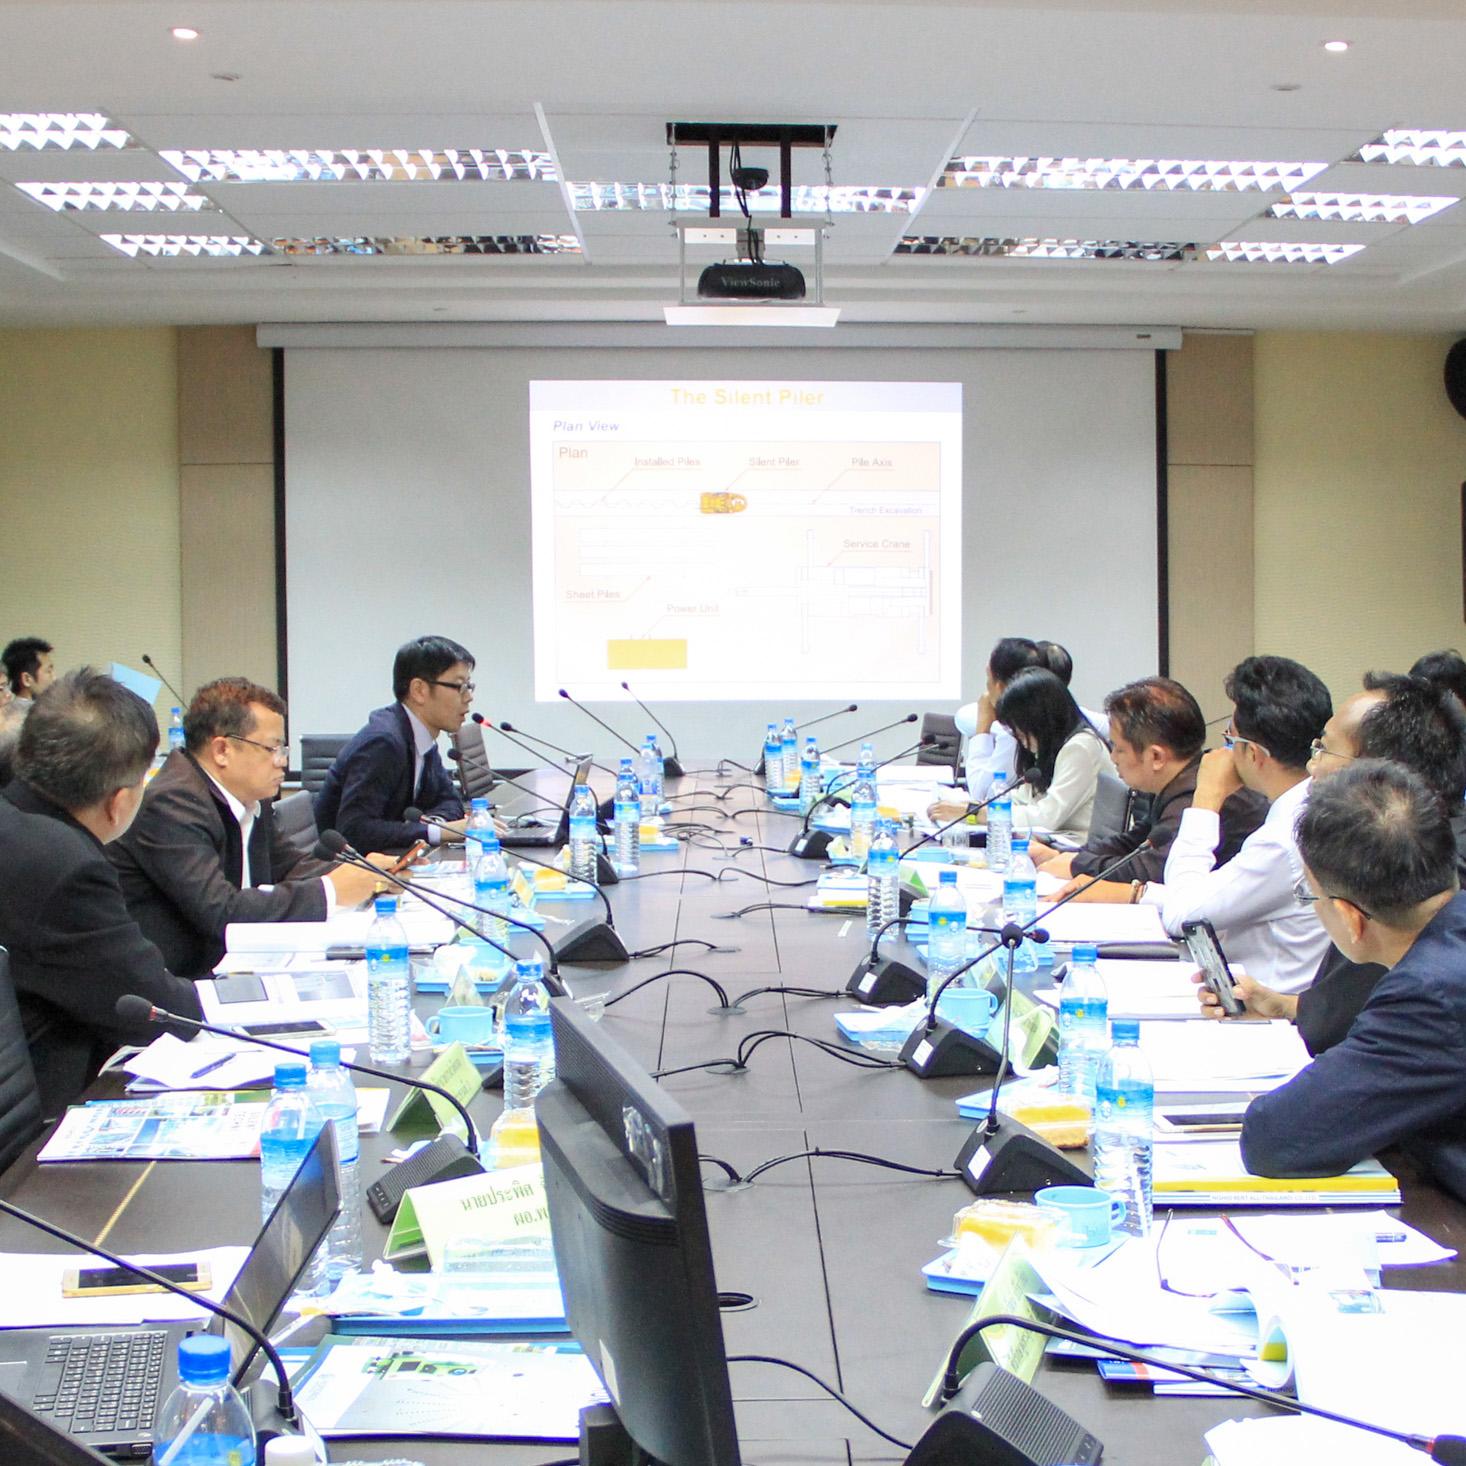 「Seminar On Japanese Construction Technology」(タイ バンコクで開催)にてプレゼンを行いました。